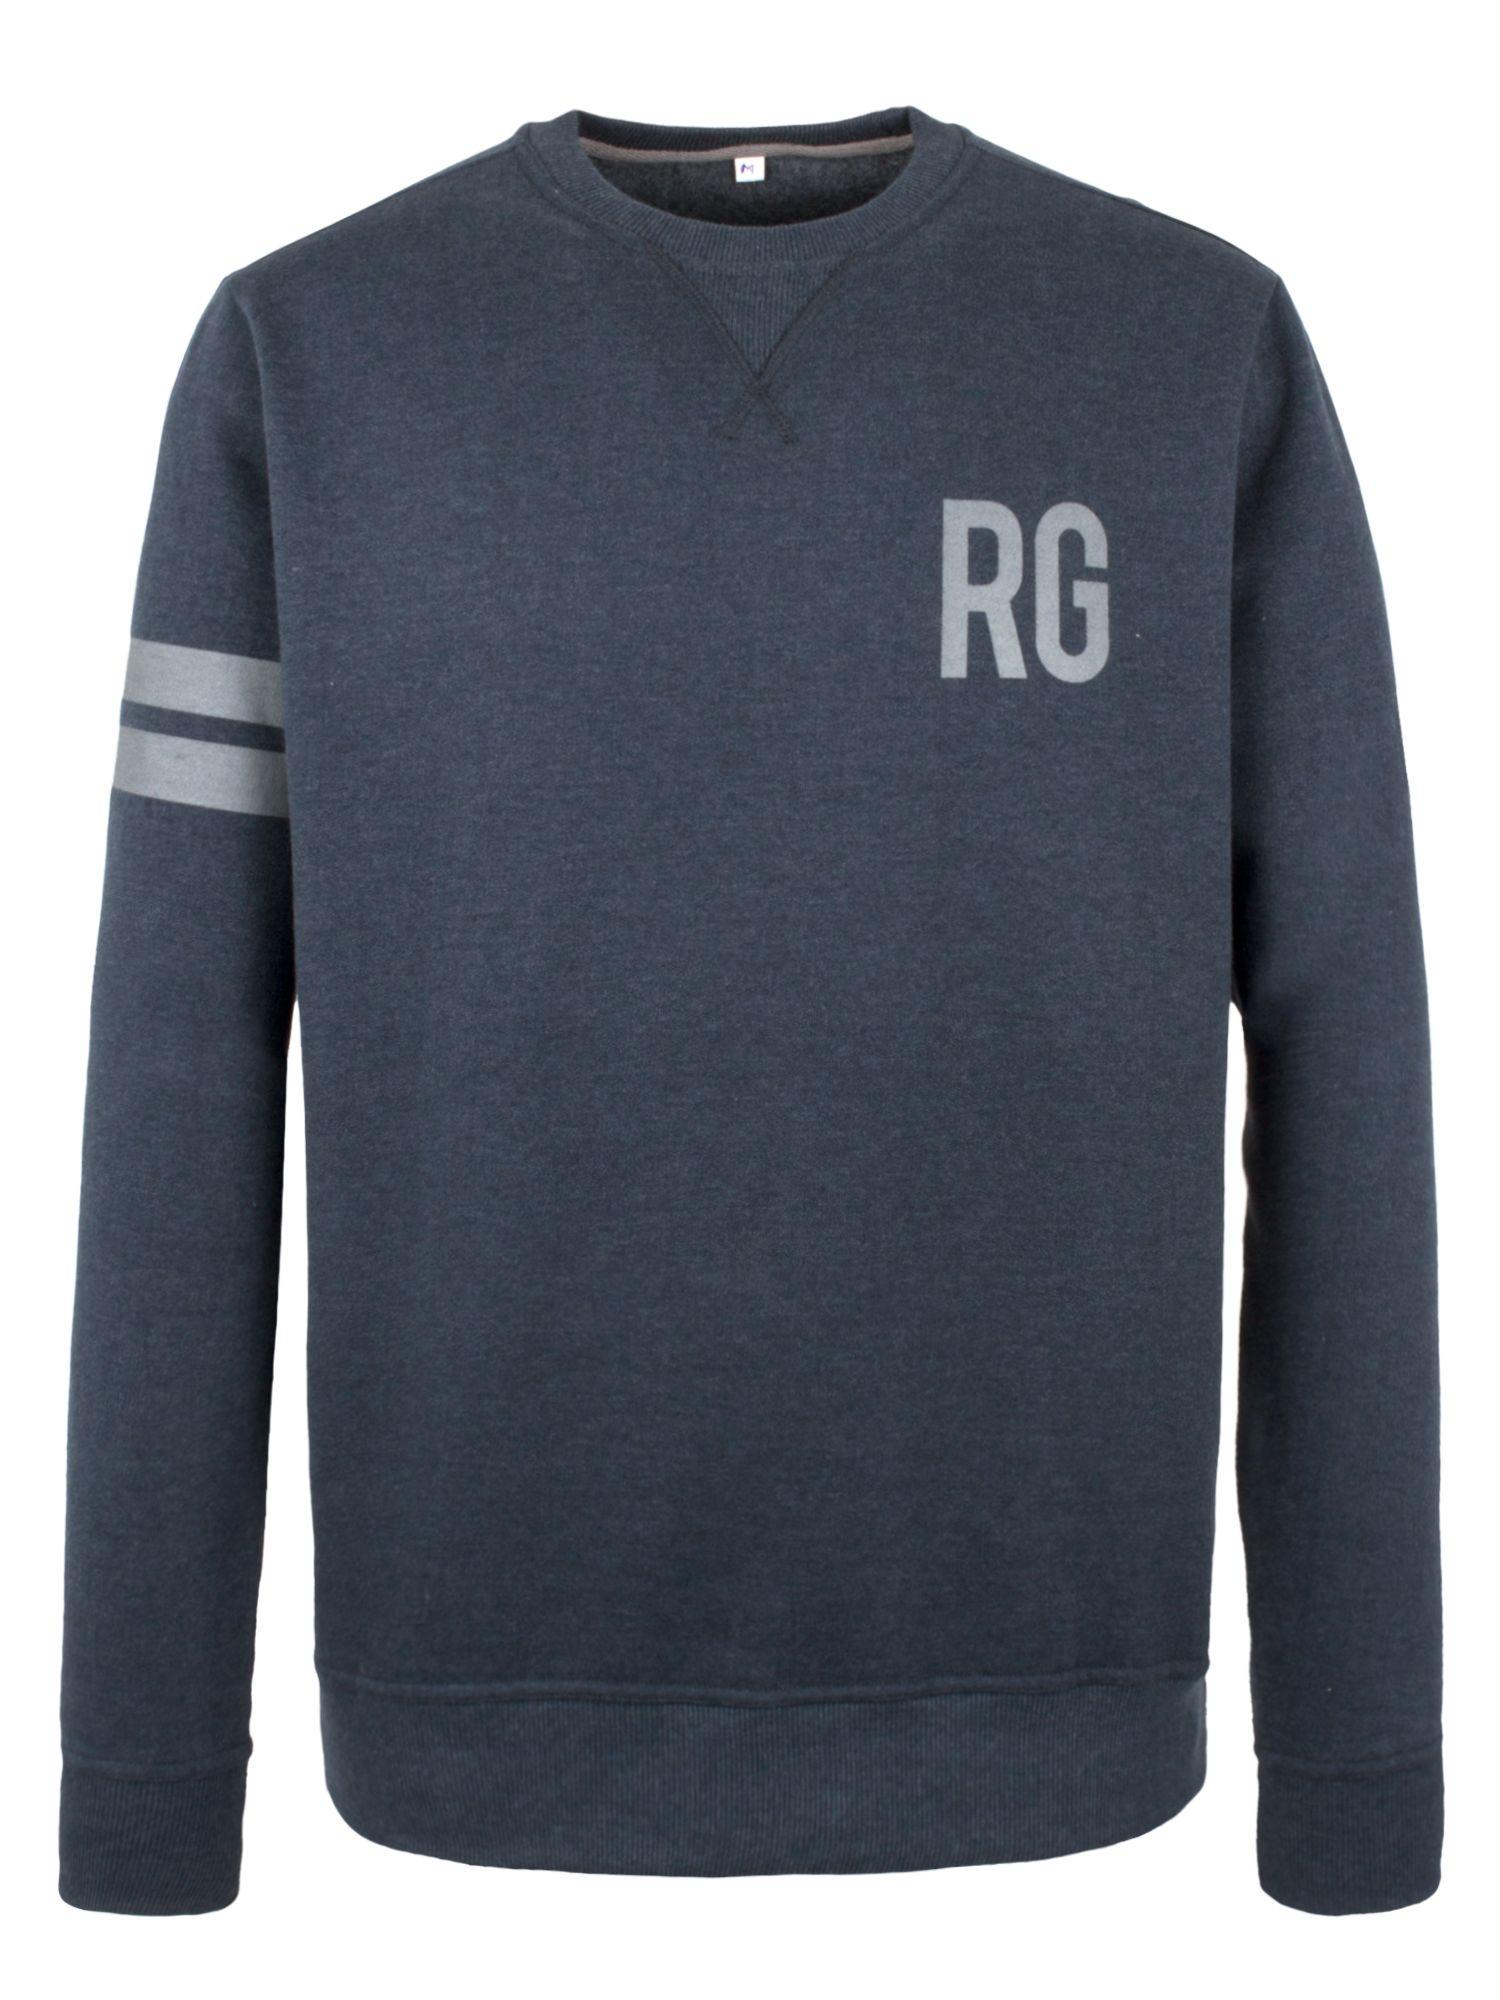 Racing green Duke Rg Logo Sweatshirt in Blue for Men